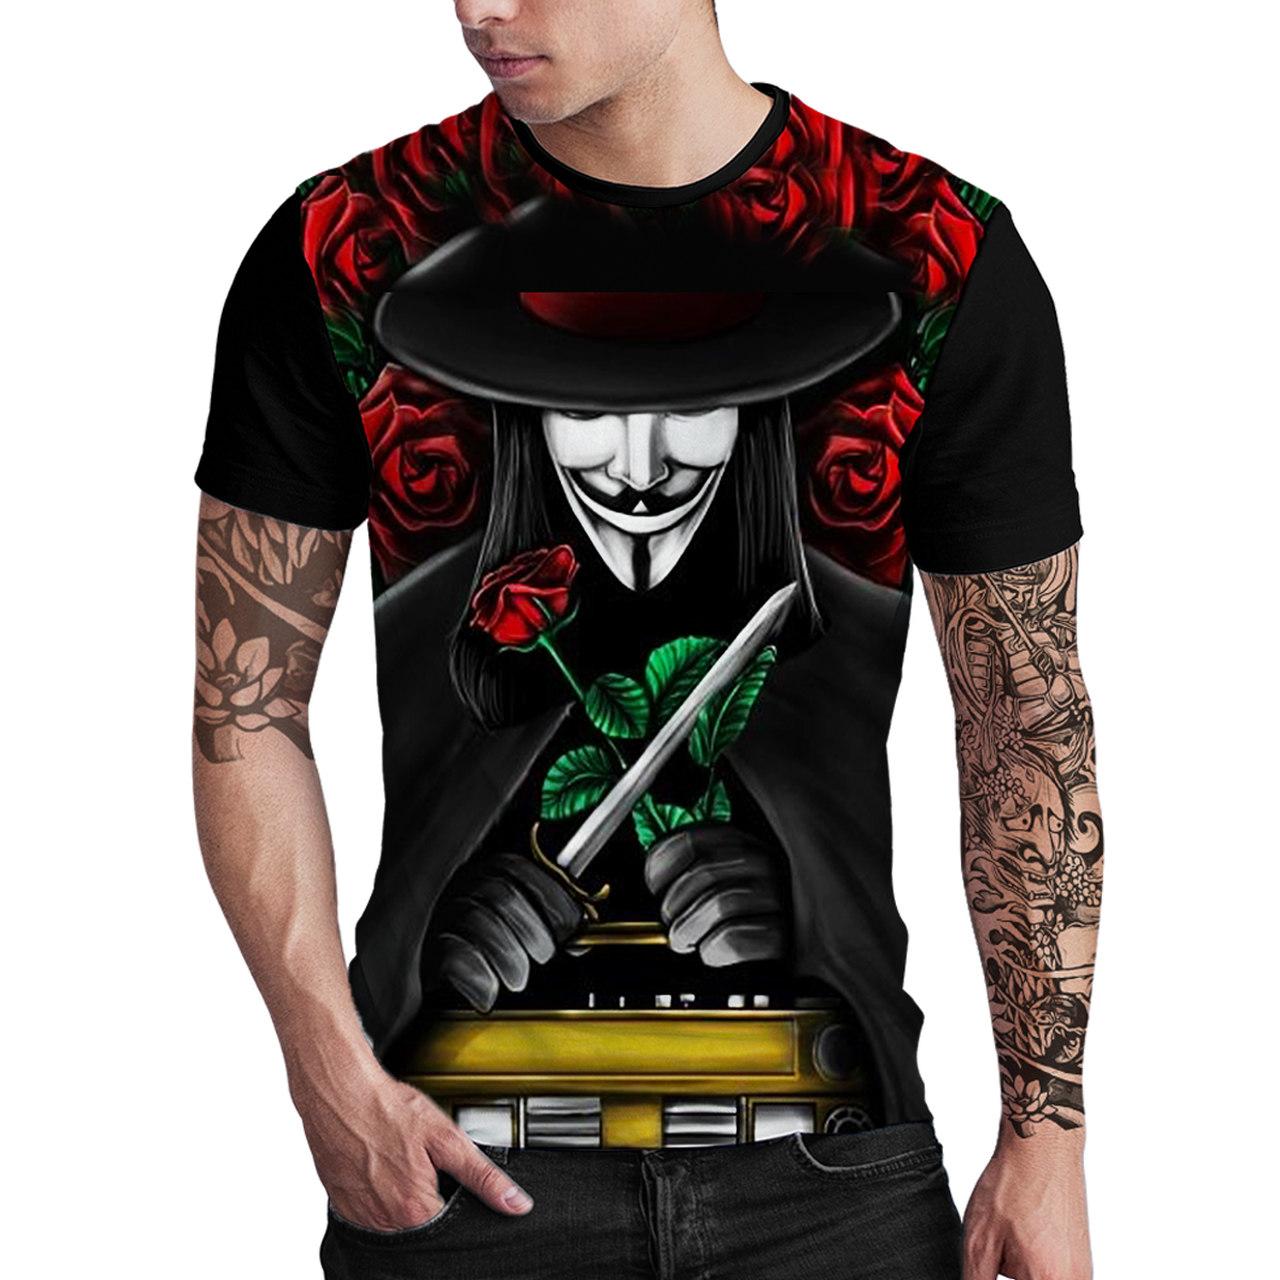 Stompy Camiseta Estampada Masculina Modelo 67